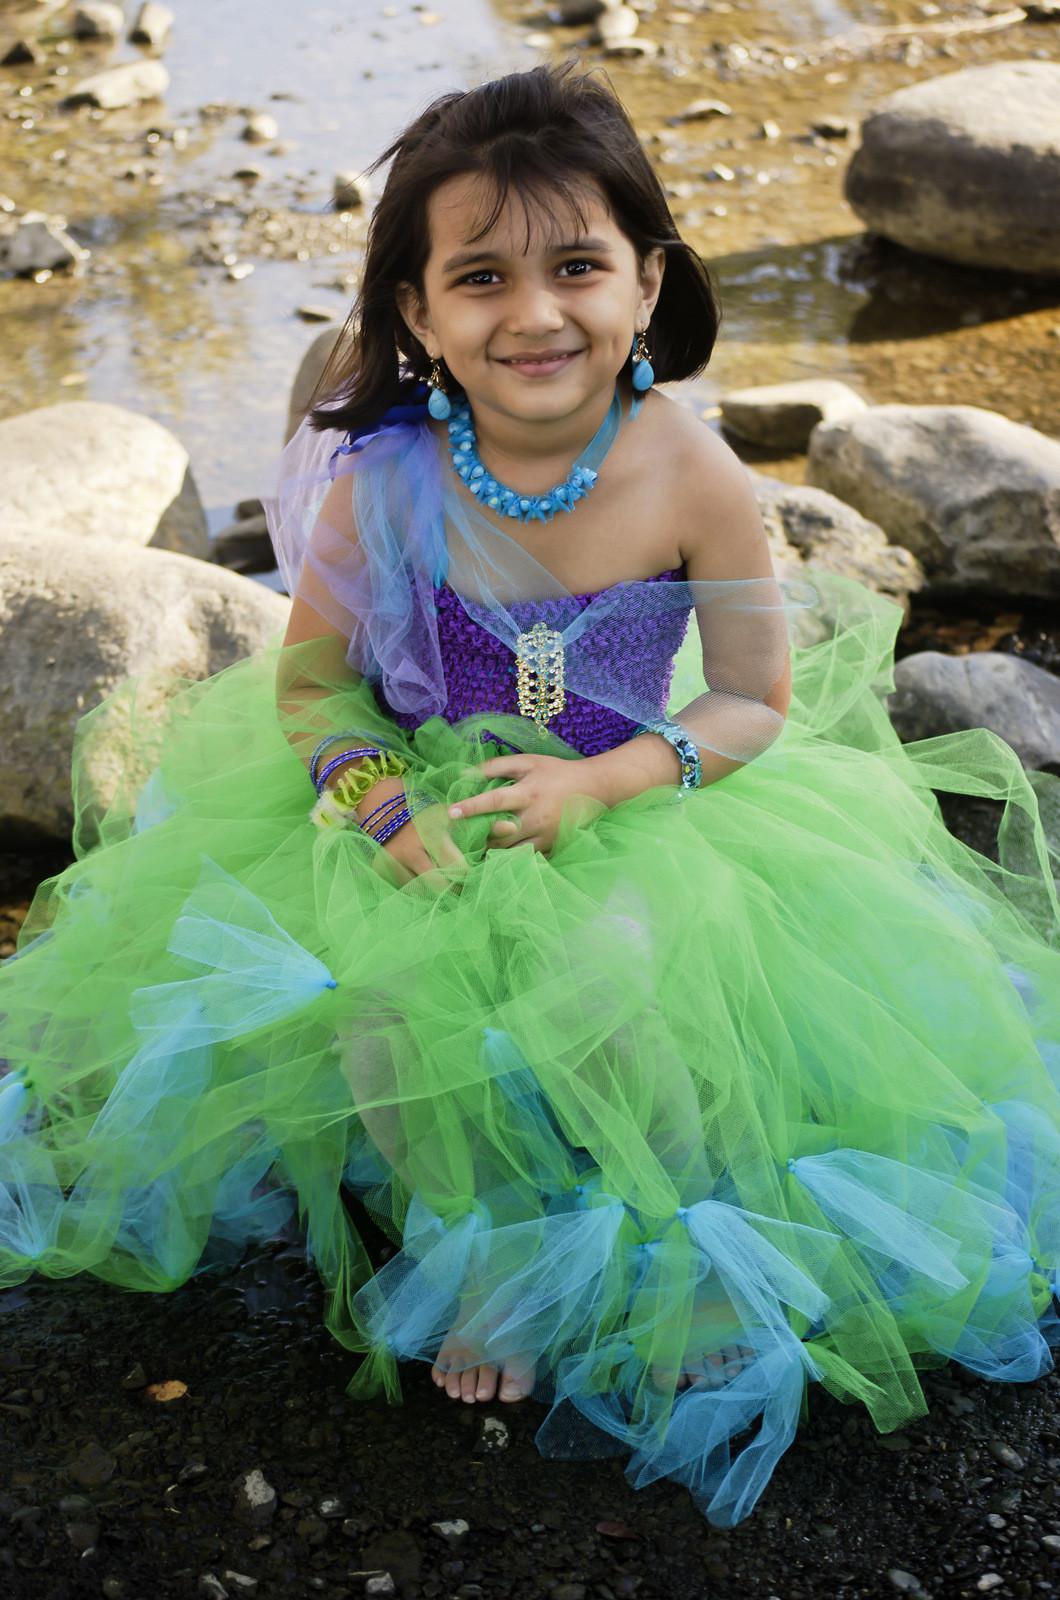 Mermaid Costume DIY  by Ami Mathur graphy